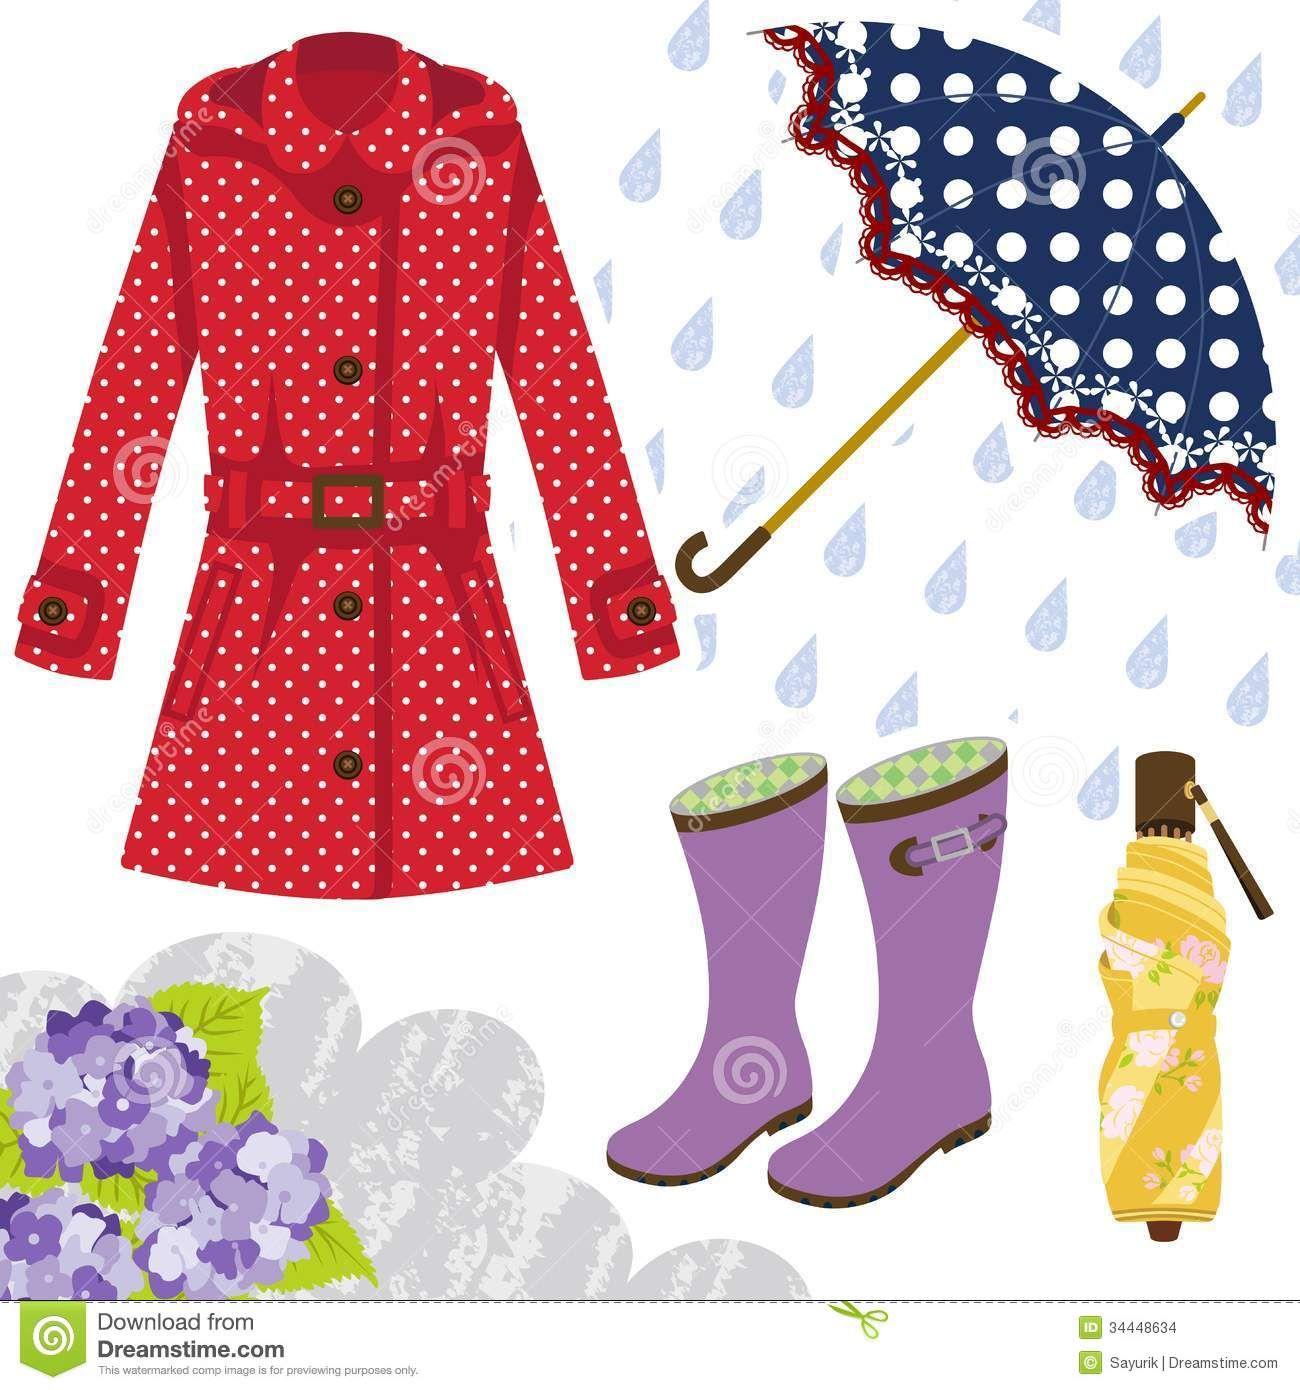 Rainy Clothes Clipart Rain Gear For Women